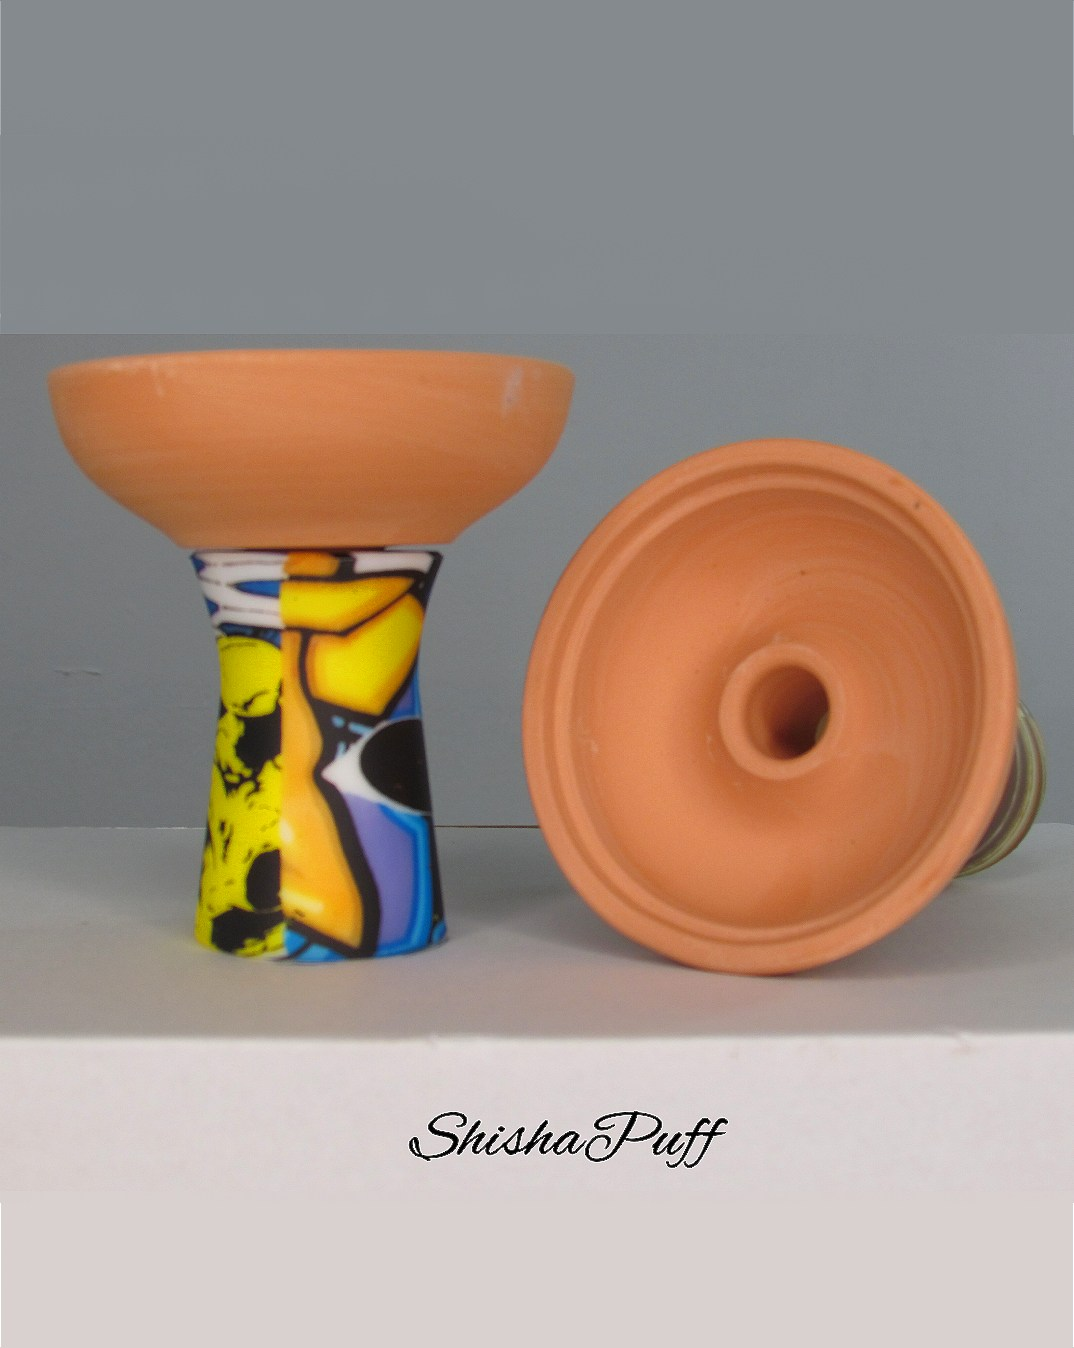 Silicone Ceramic Head graffiti color Round bowl hookah For Kaloud - Shisha Puff Cyprus Hookah